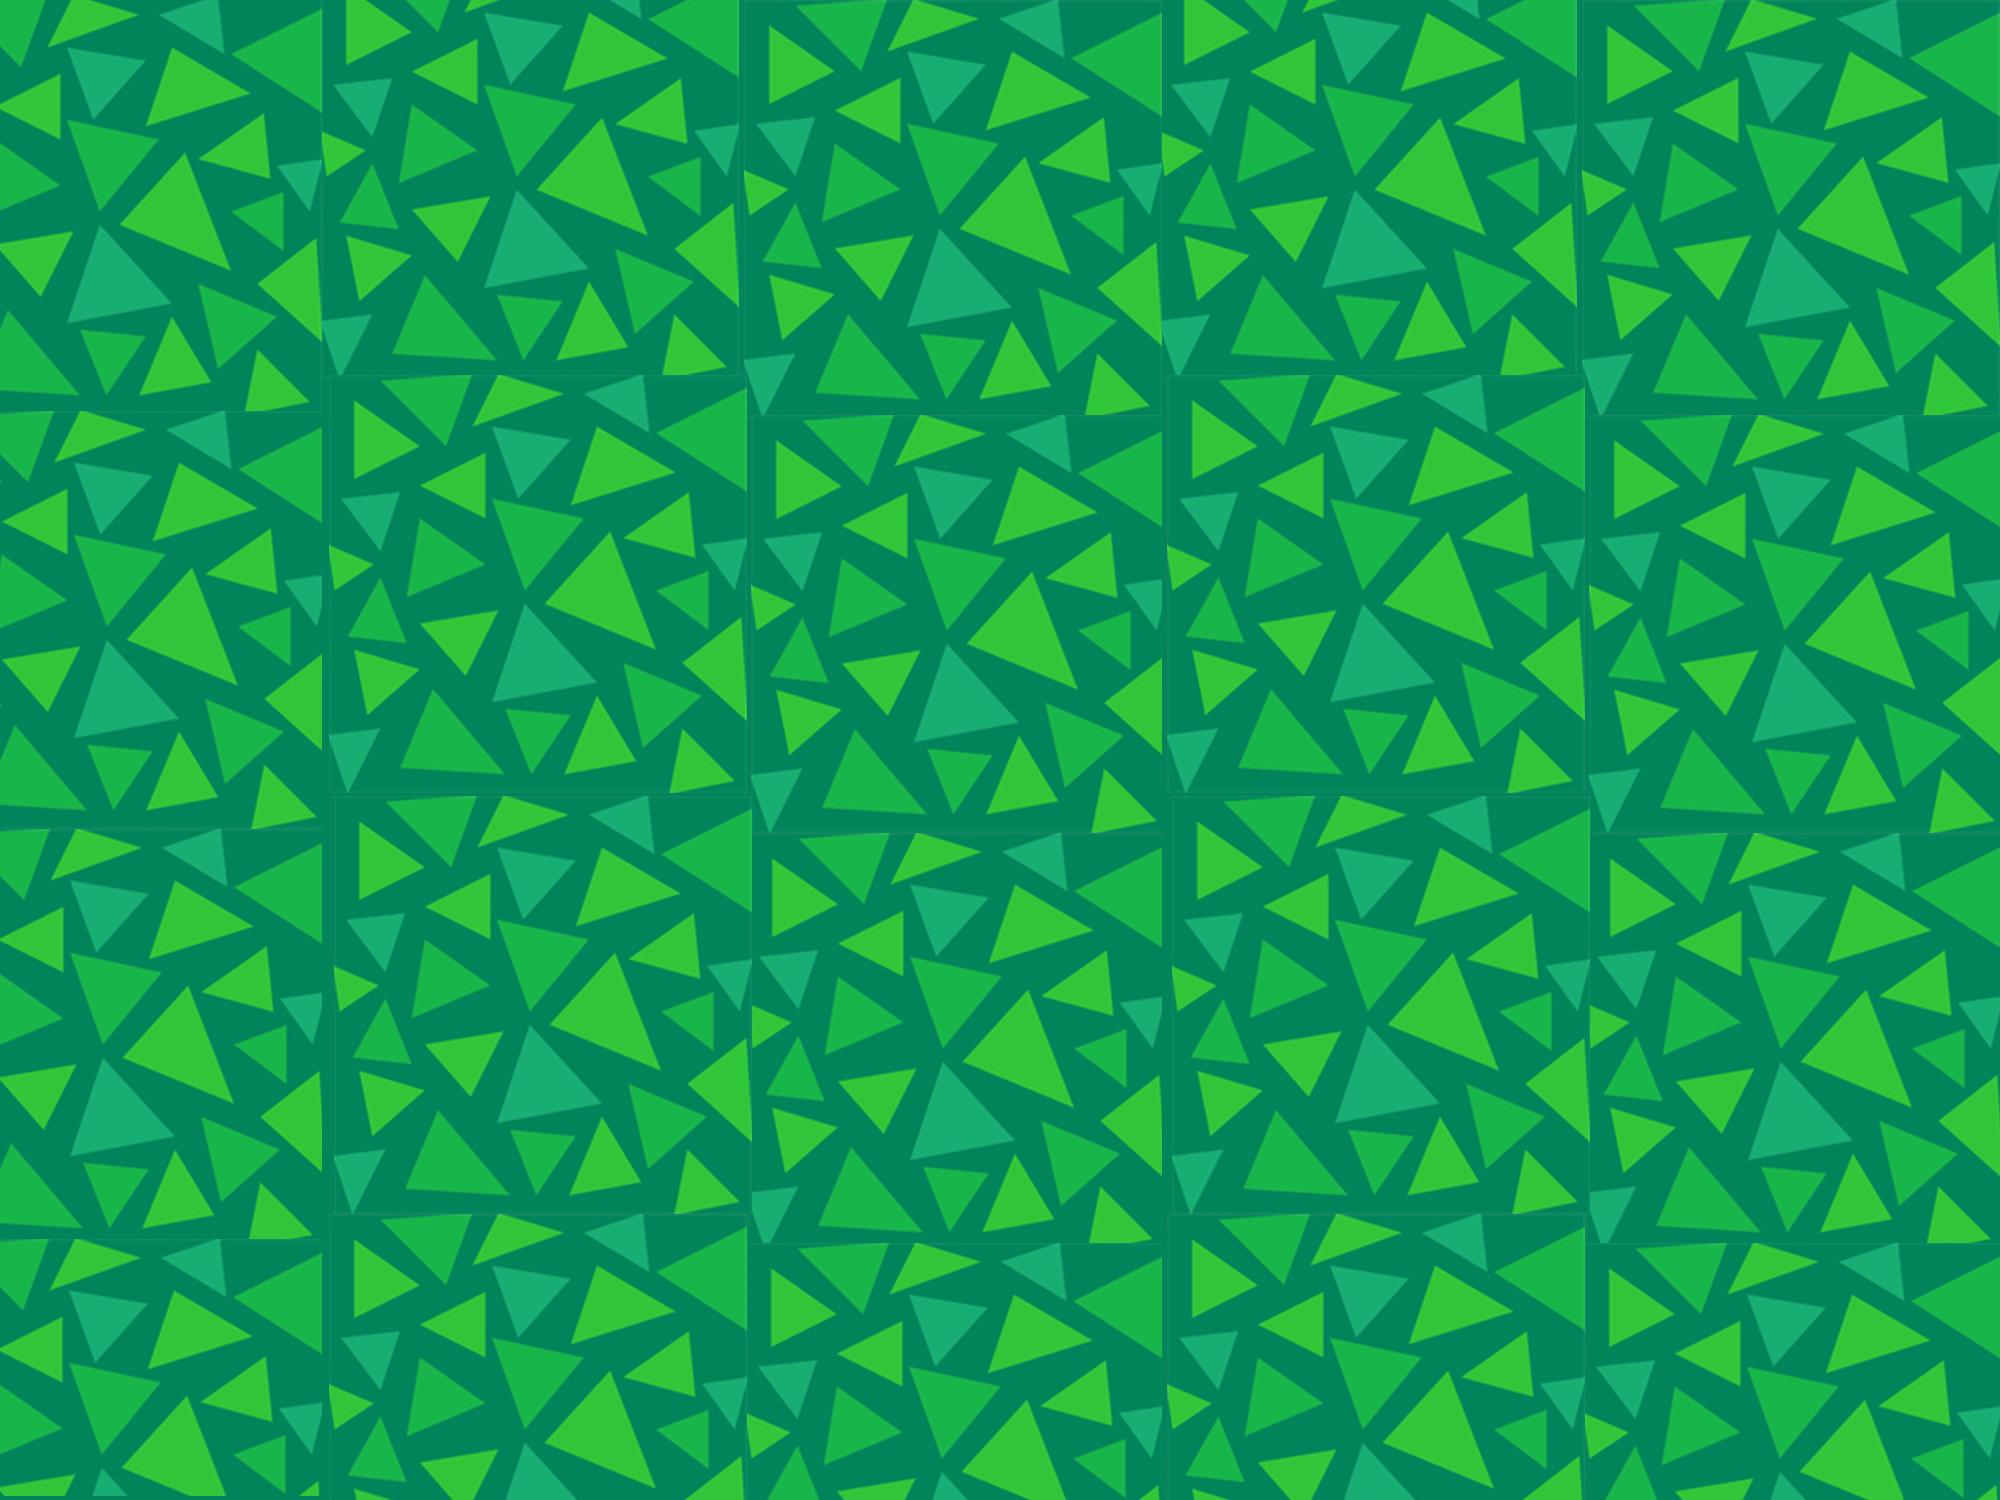 Animal crossing · grass_wallpaper.png (2000×1500)